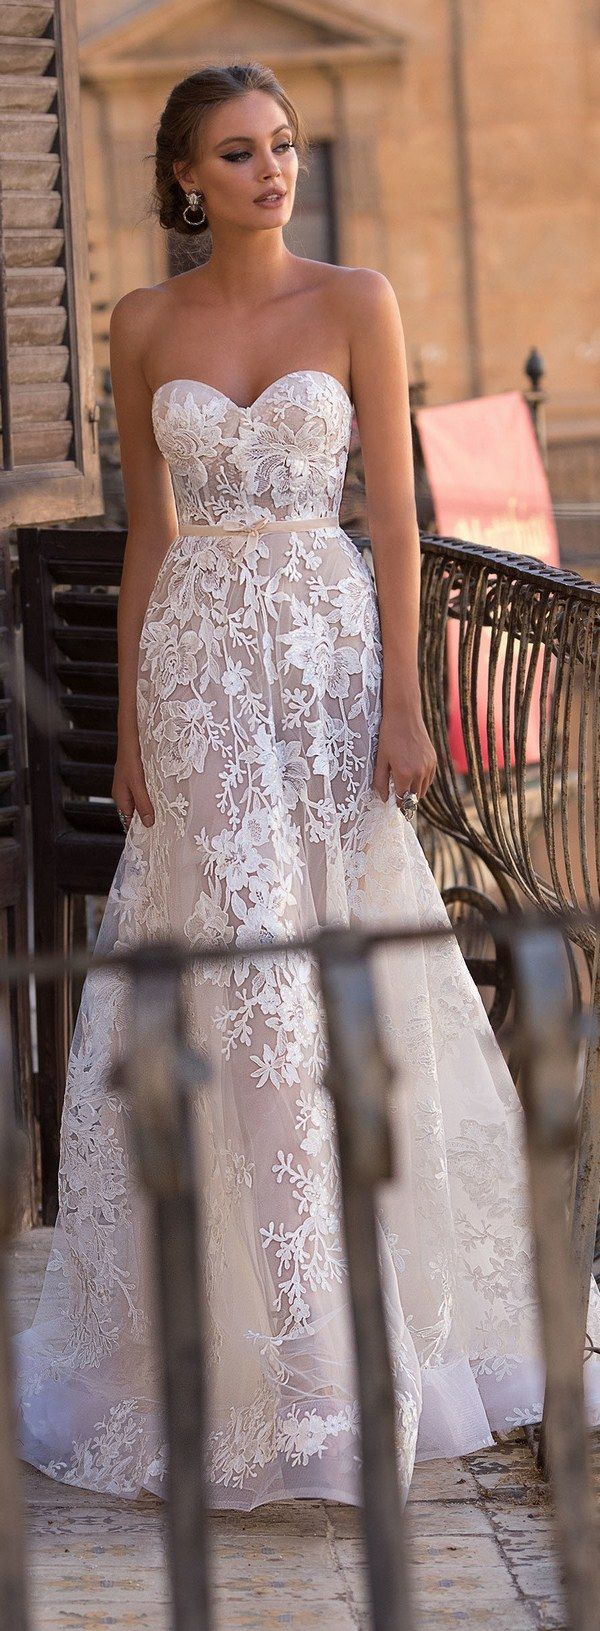 MUSE by Berta Sicily Wedding Dresses 2018 #weddingdress #wedding #bride #dress #...